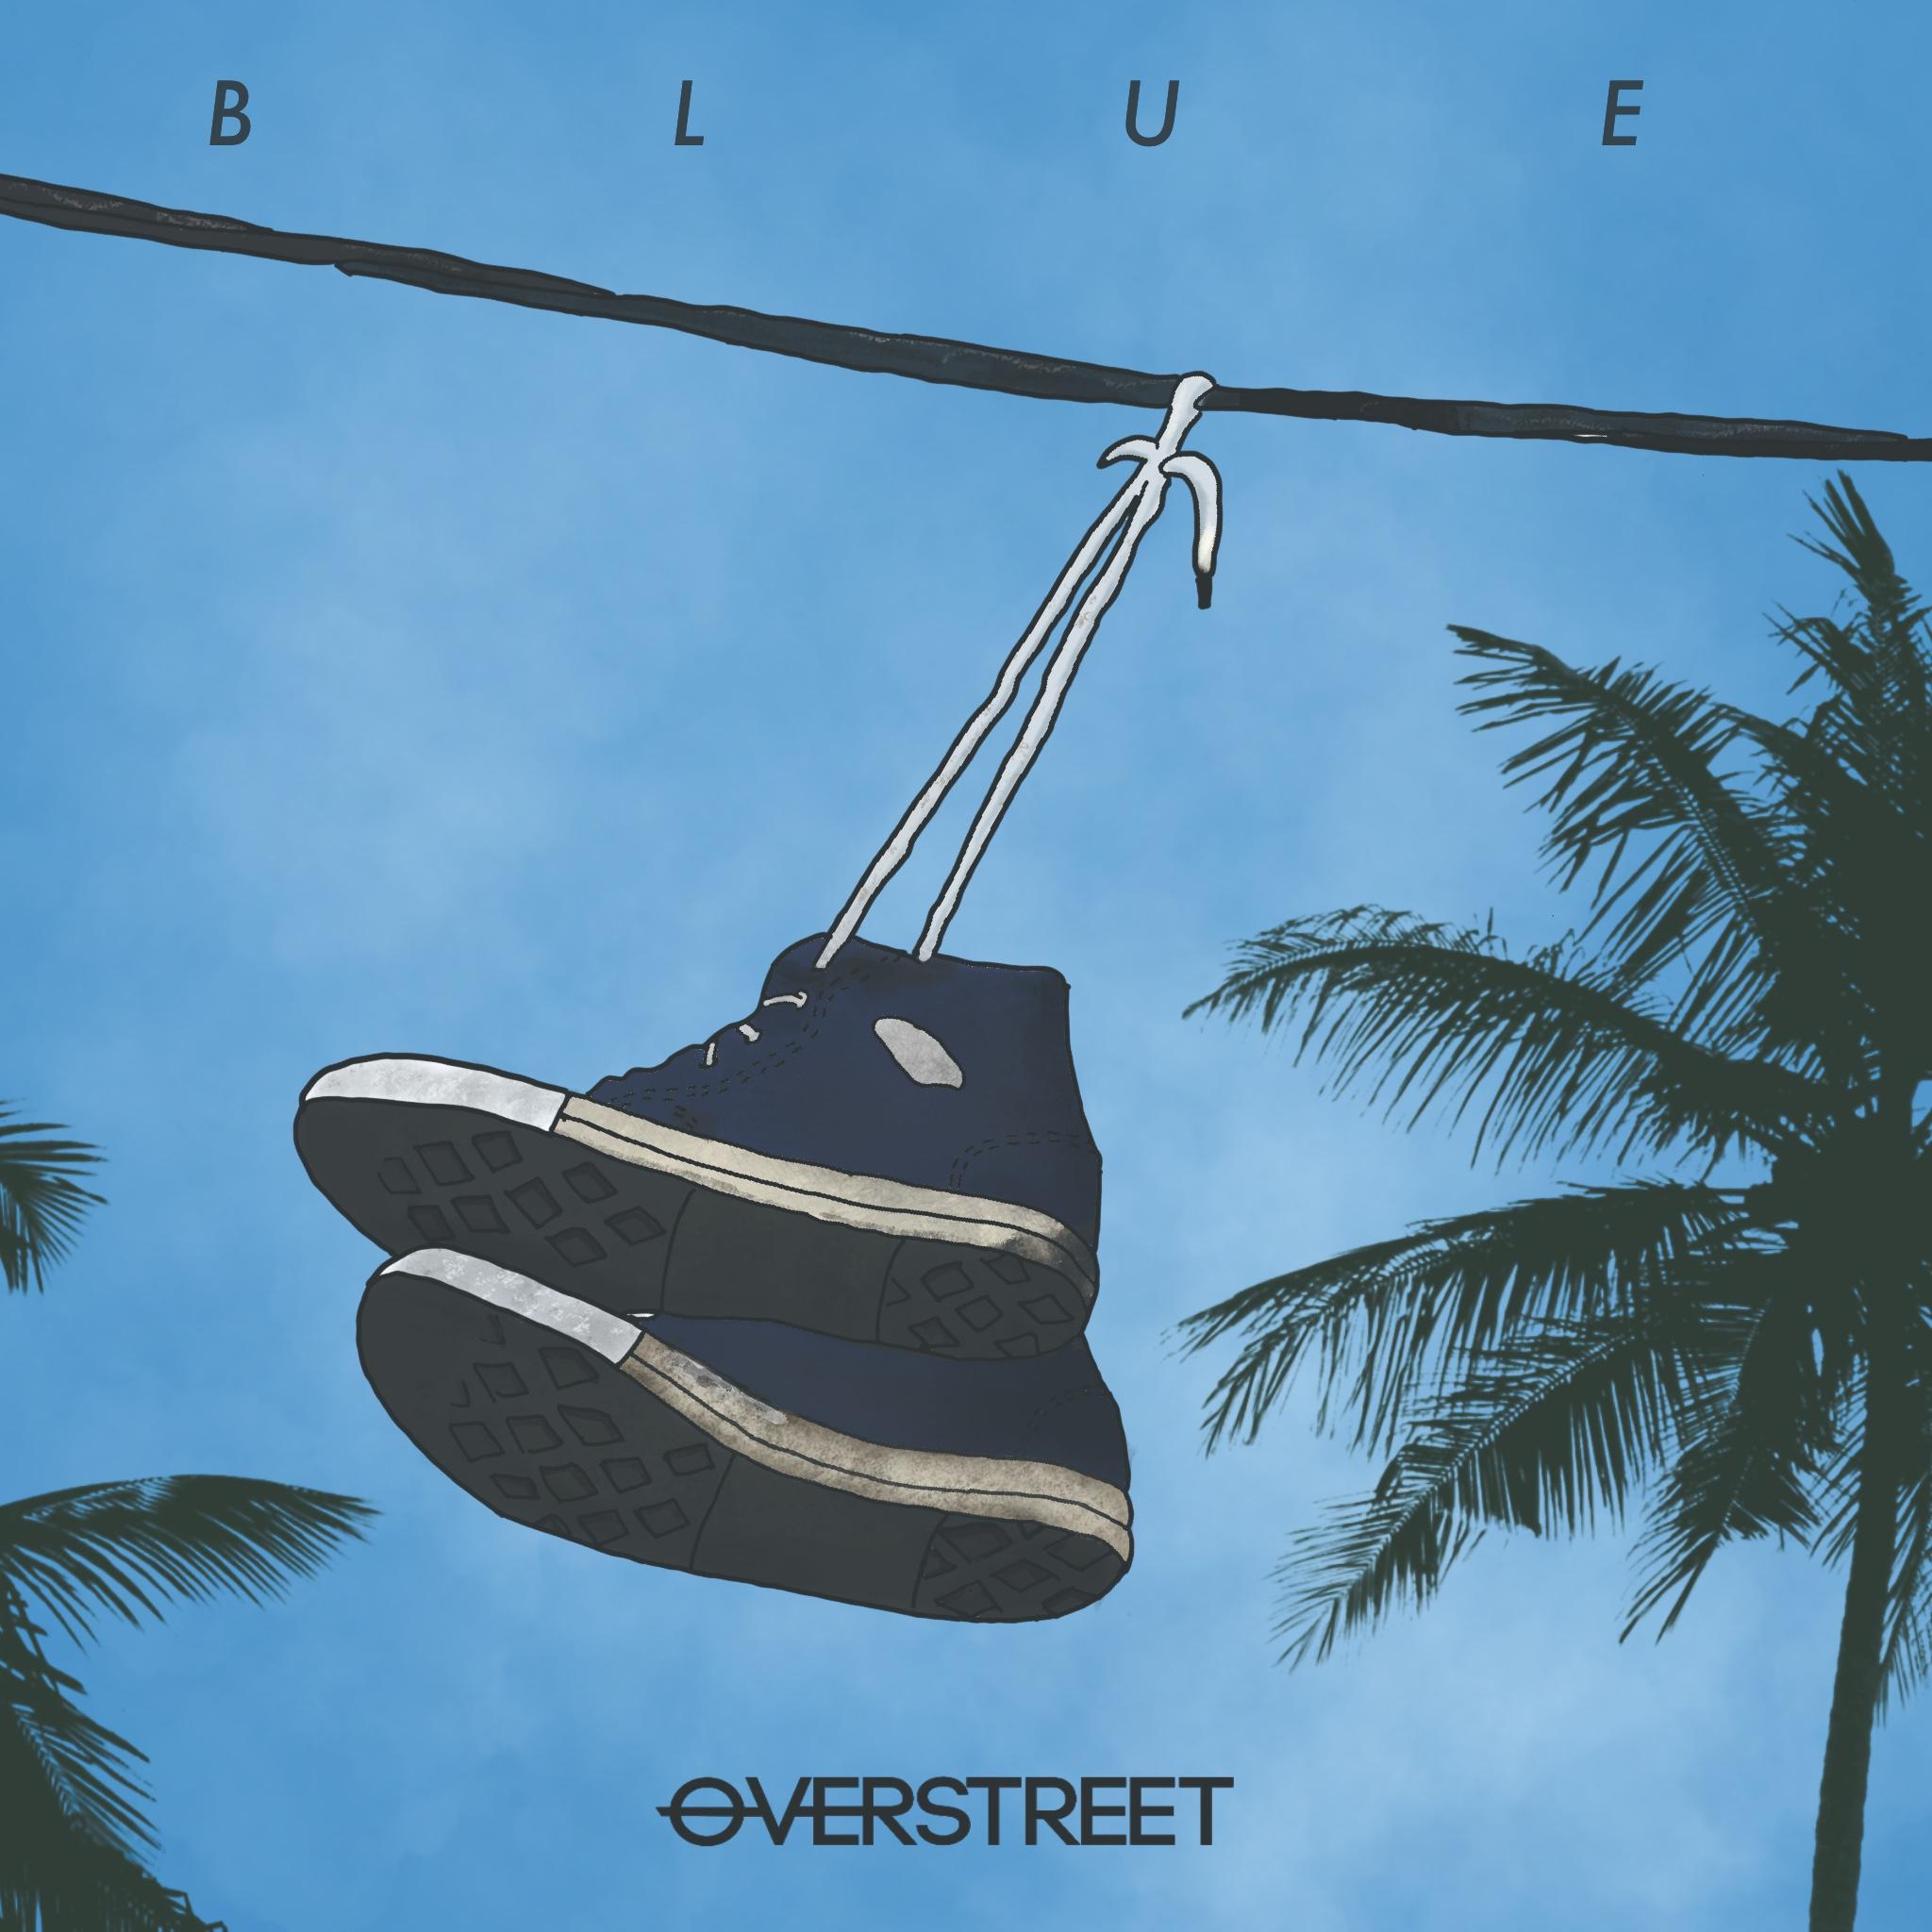 Chord Overstreet率いるバンド「OVERSTREET」が新曲「Blue」を世界に先駆けて日本で先行配信